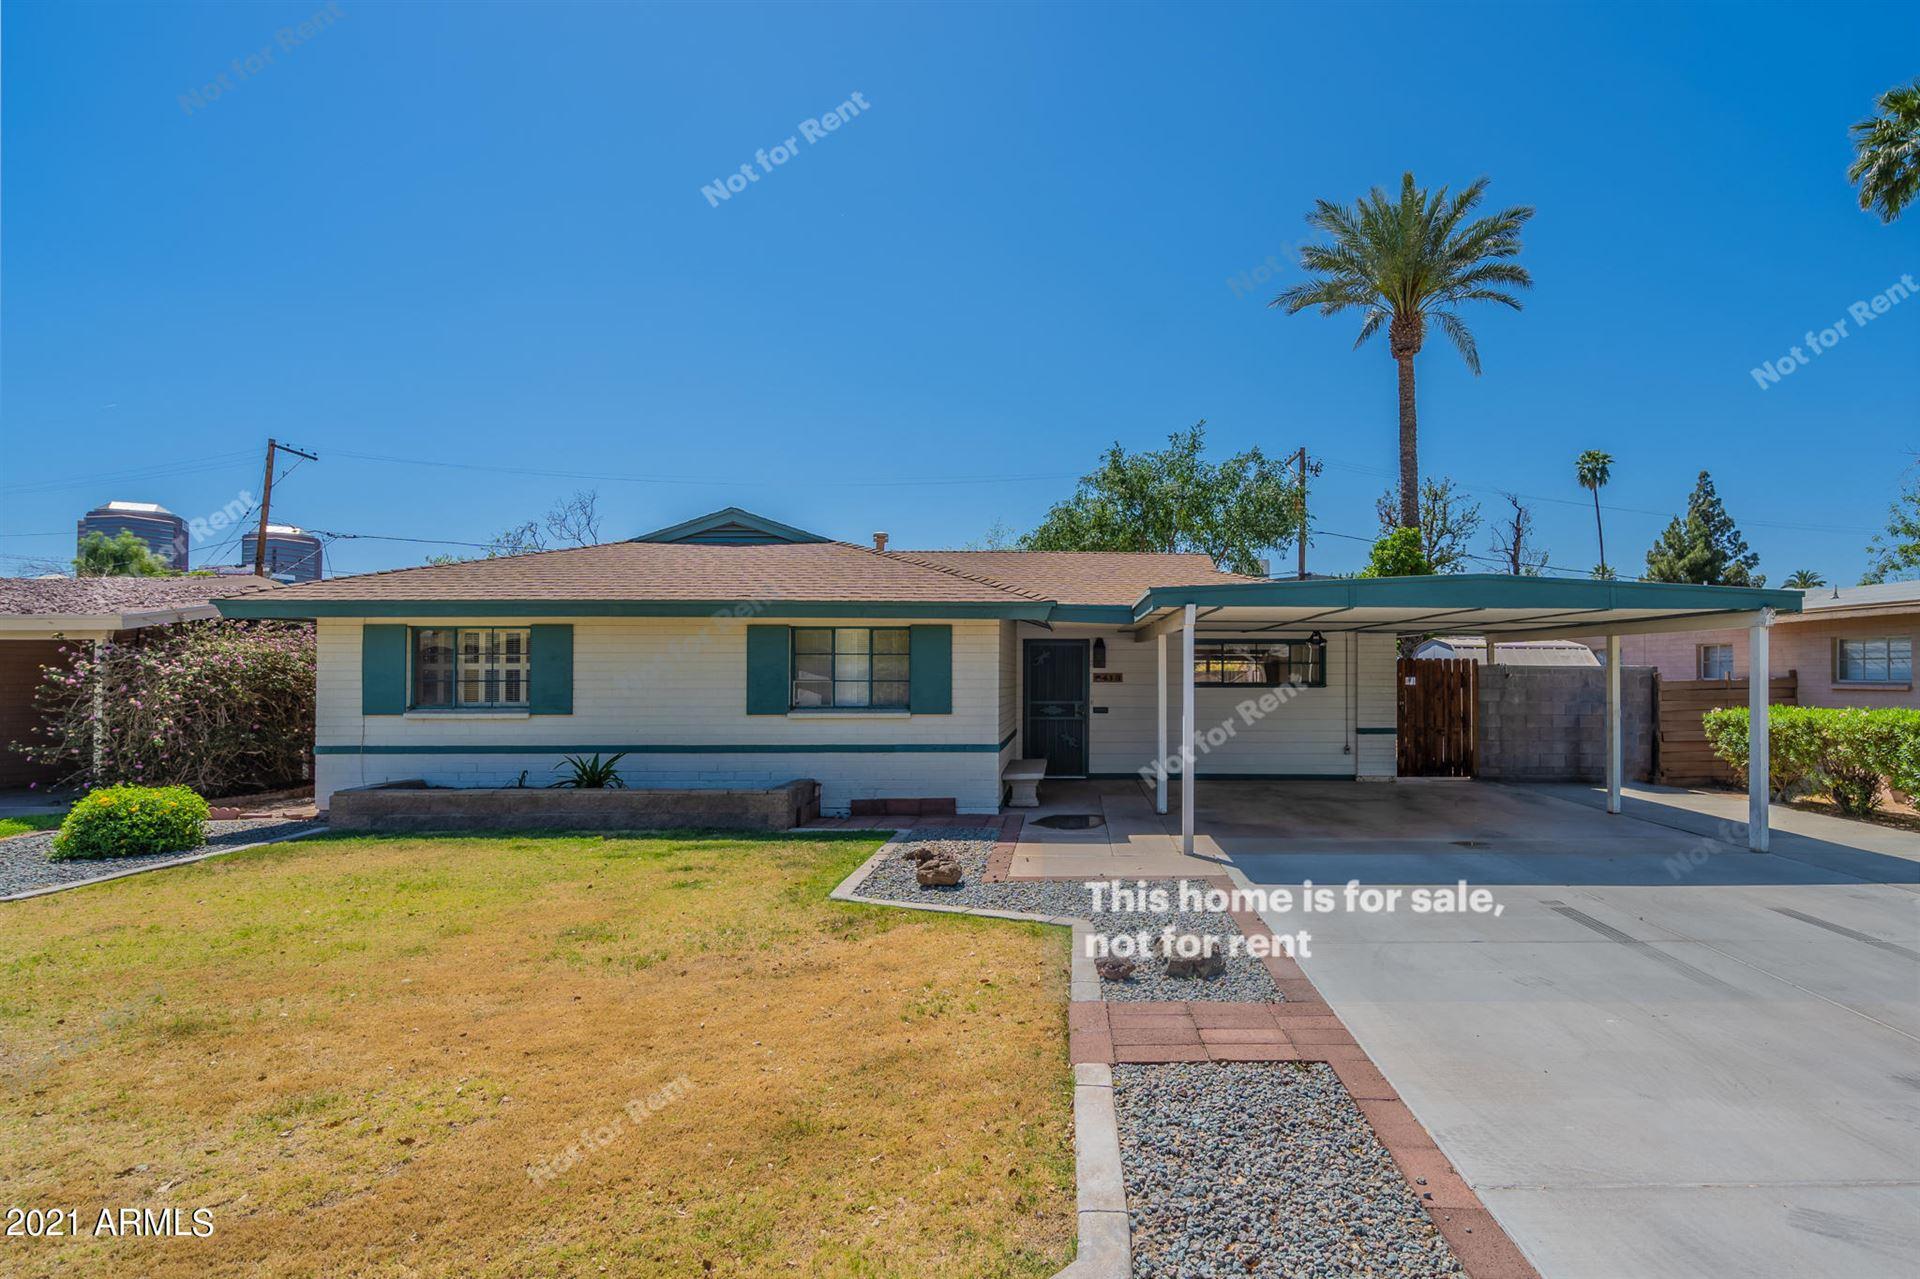 413 W FLOWER Street, Phoenix, AZ 85013 - MLS#: 6220804